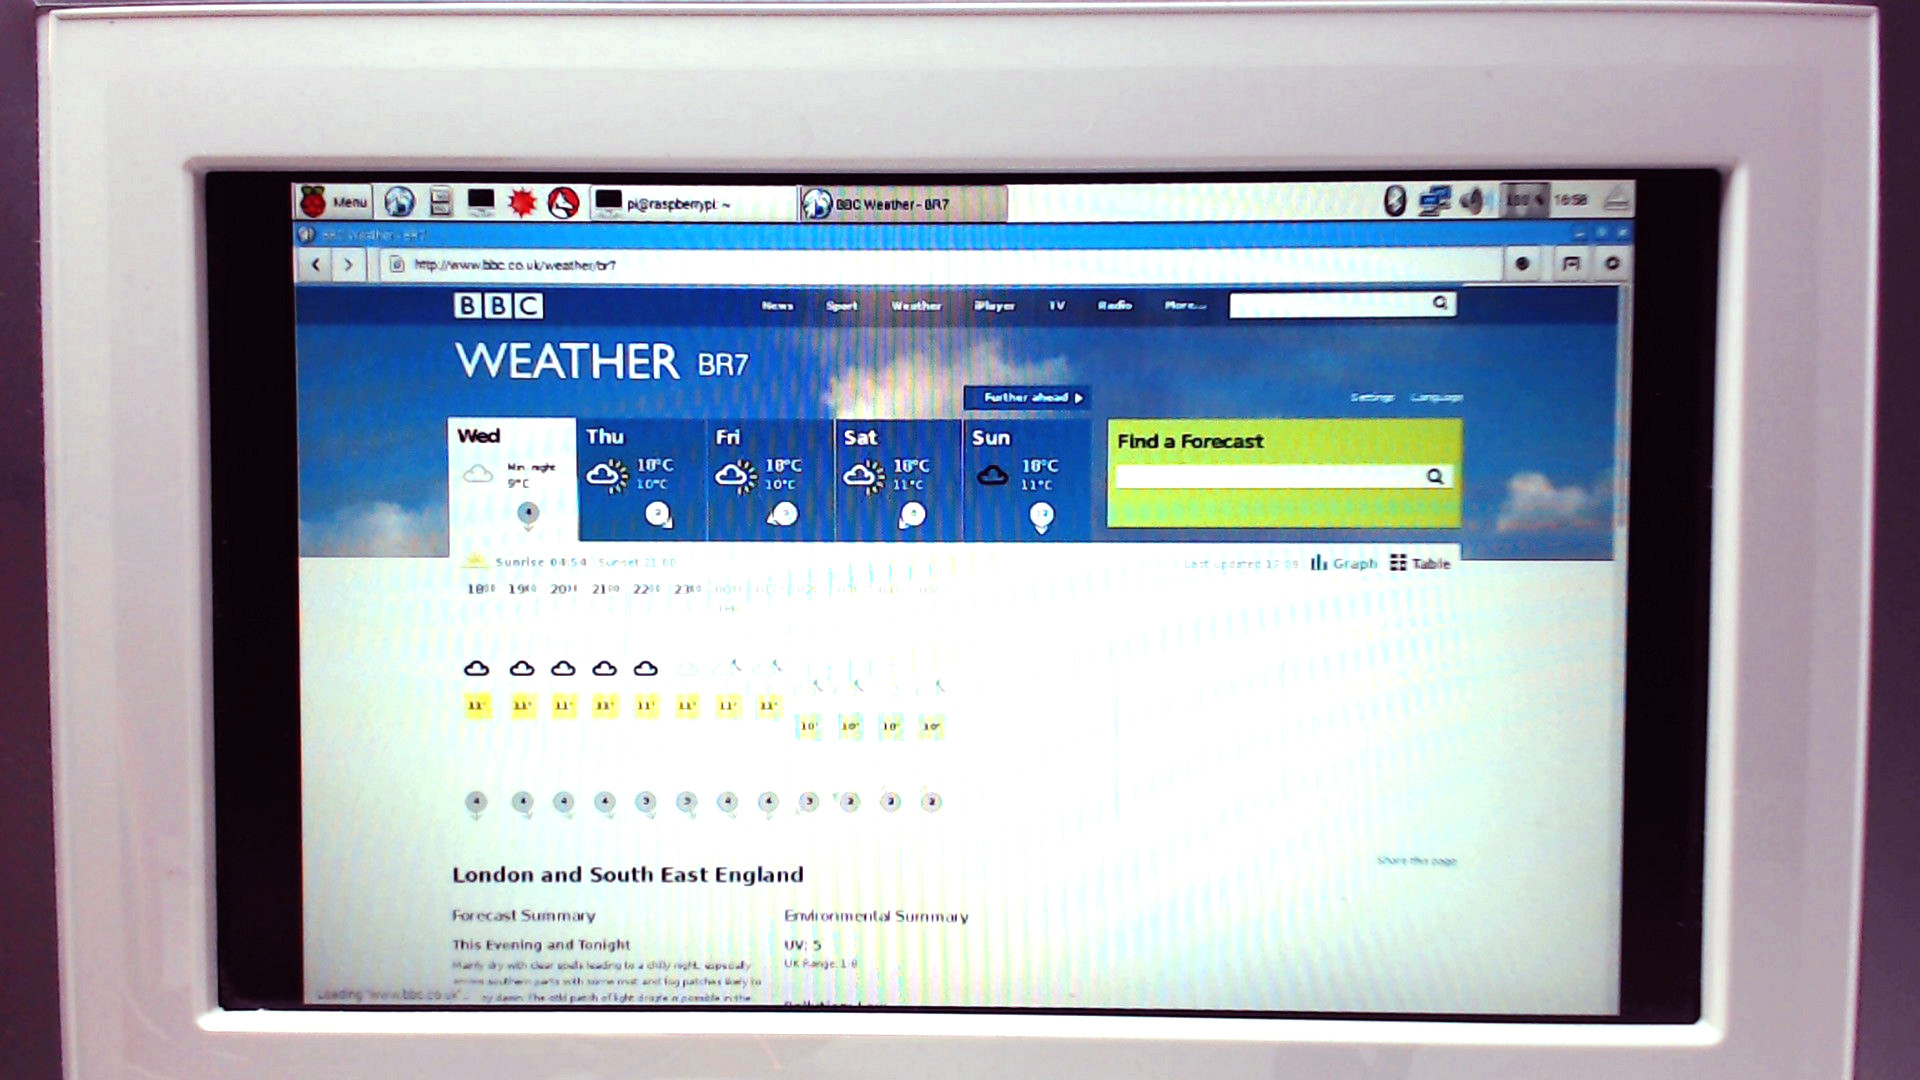 Pi Zero Digital Frame Kiosk Uses OTG Right | Hackaday